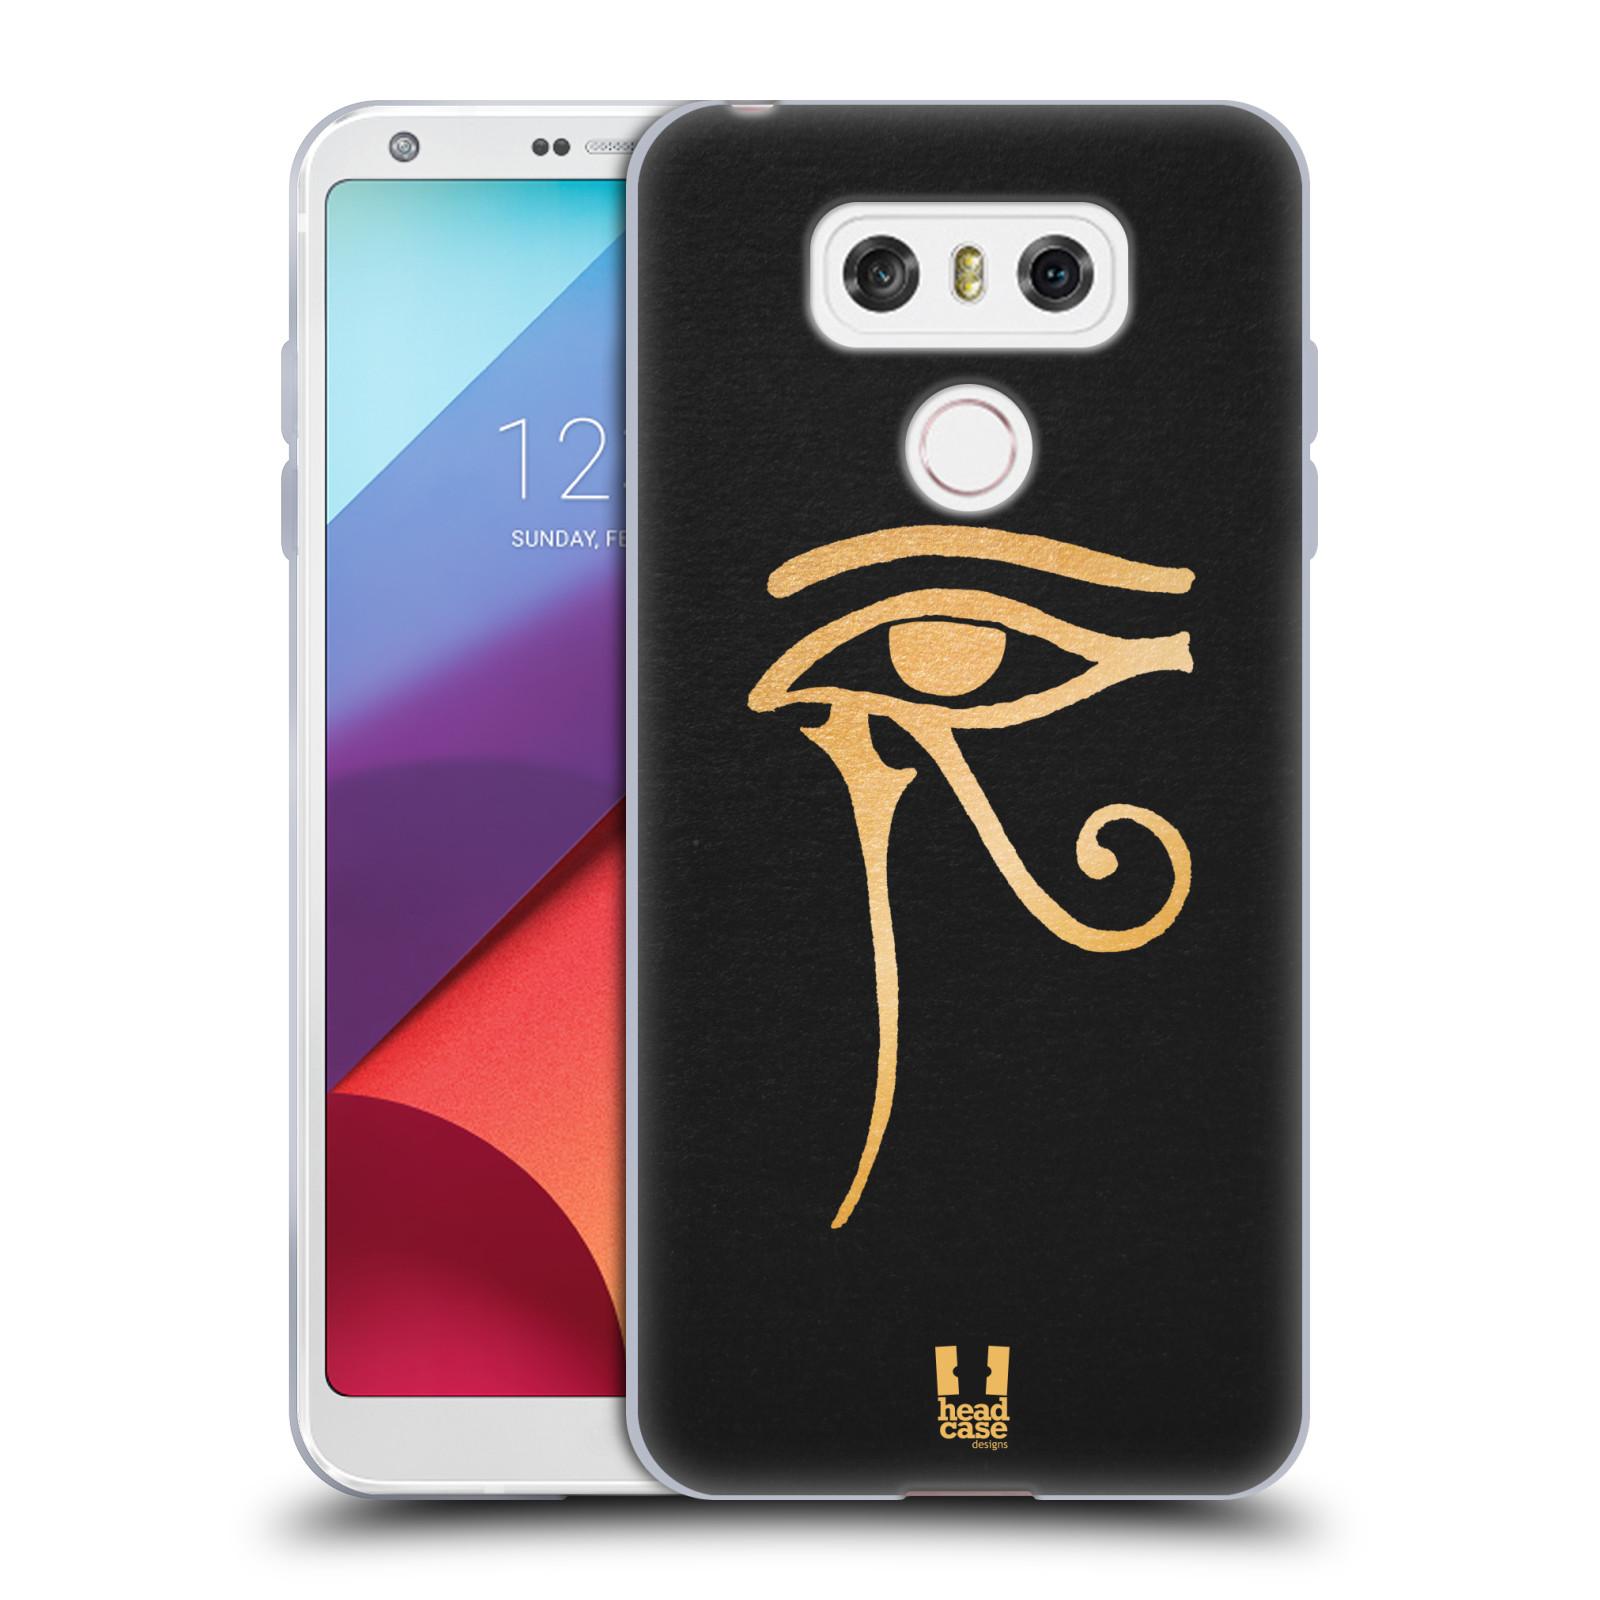 Silikonové pouzdro na mobil LG G6 - Head Case EGYPT OKO BOHA RA (Silikonový kryt či obal na mobilní telefon LG G6 H870 / LG G6 Dual SIM H870DS)